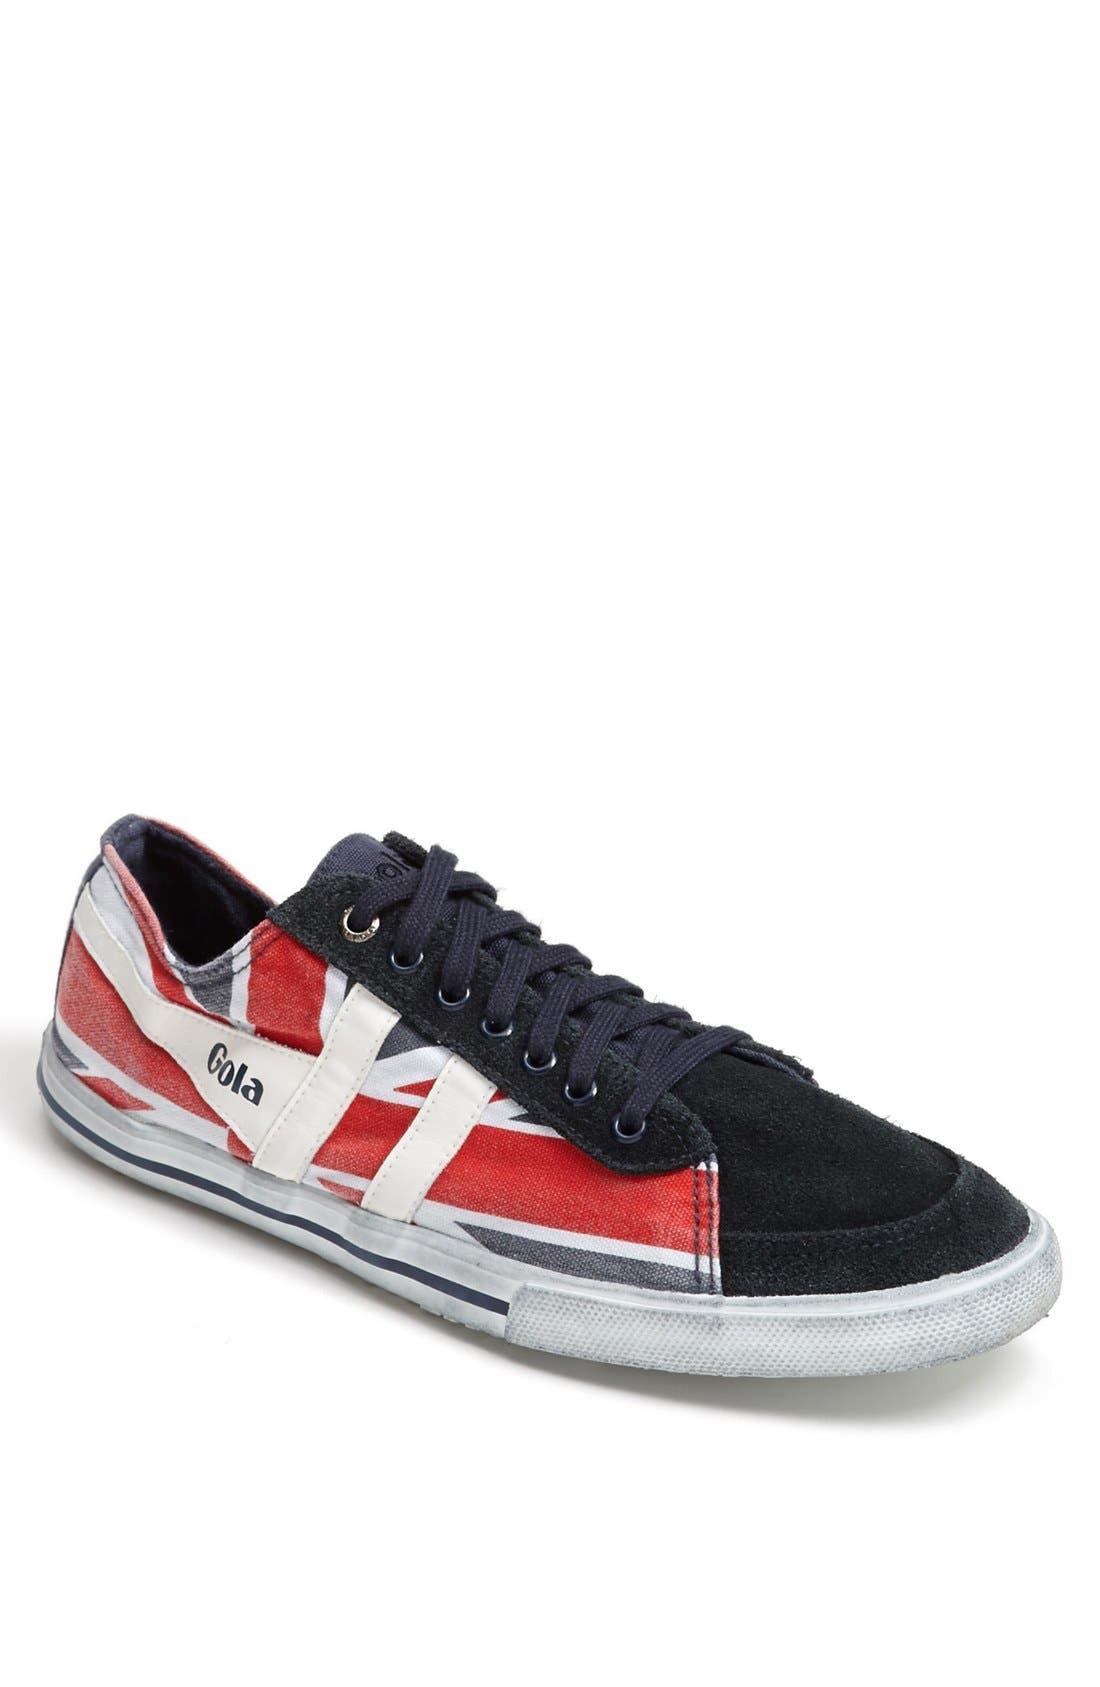 Alternate Image 1 Selected - Gola 'Quota - Union Jack' Sneaker (Men)